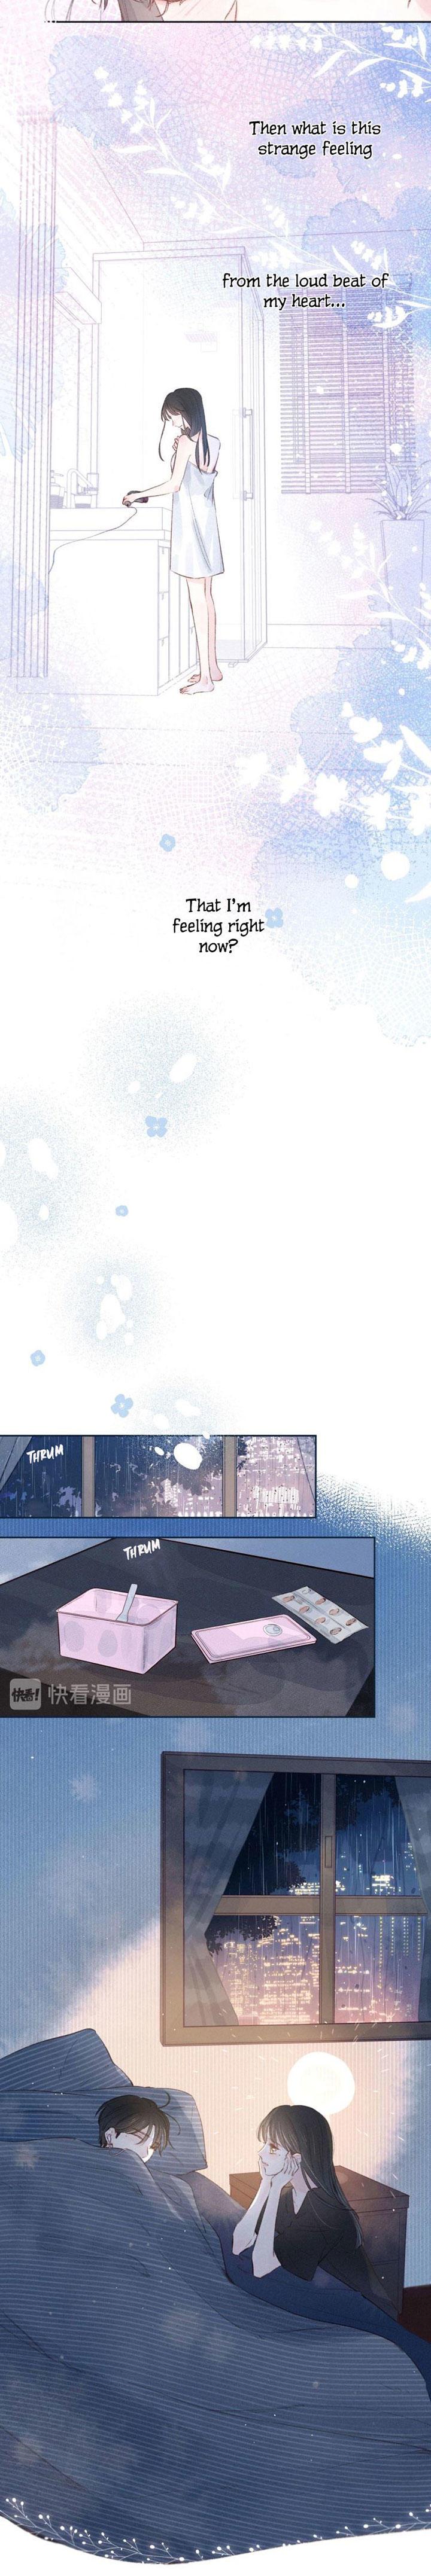 Hydrangea Melancholy Chapter 9 page 13 - Mangakakalots.com